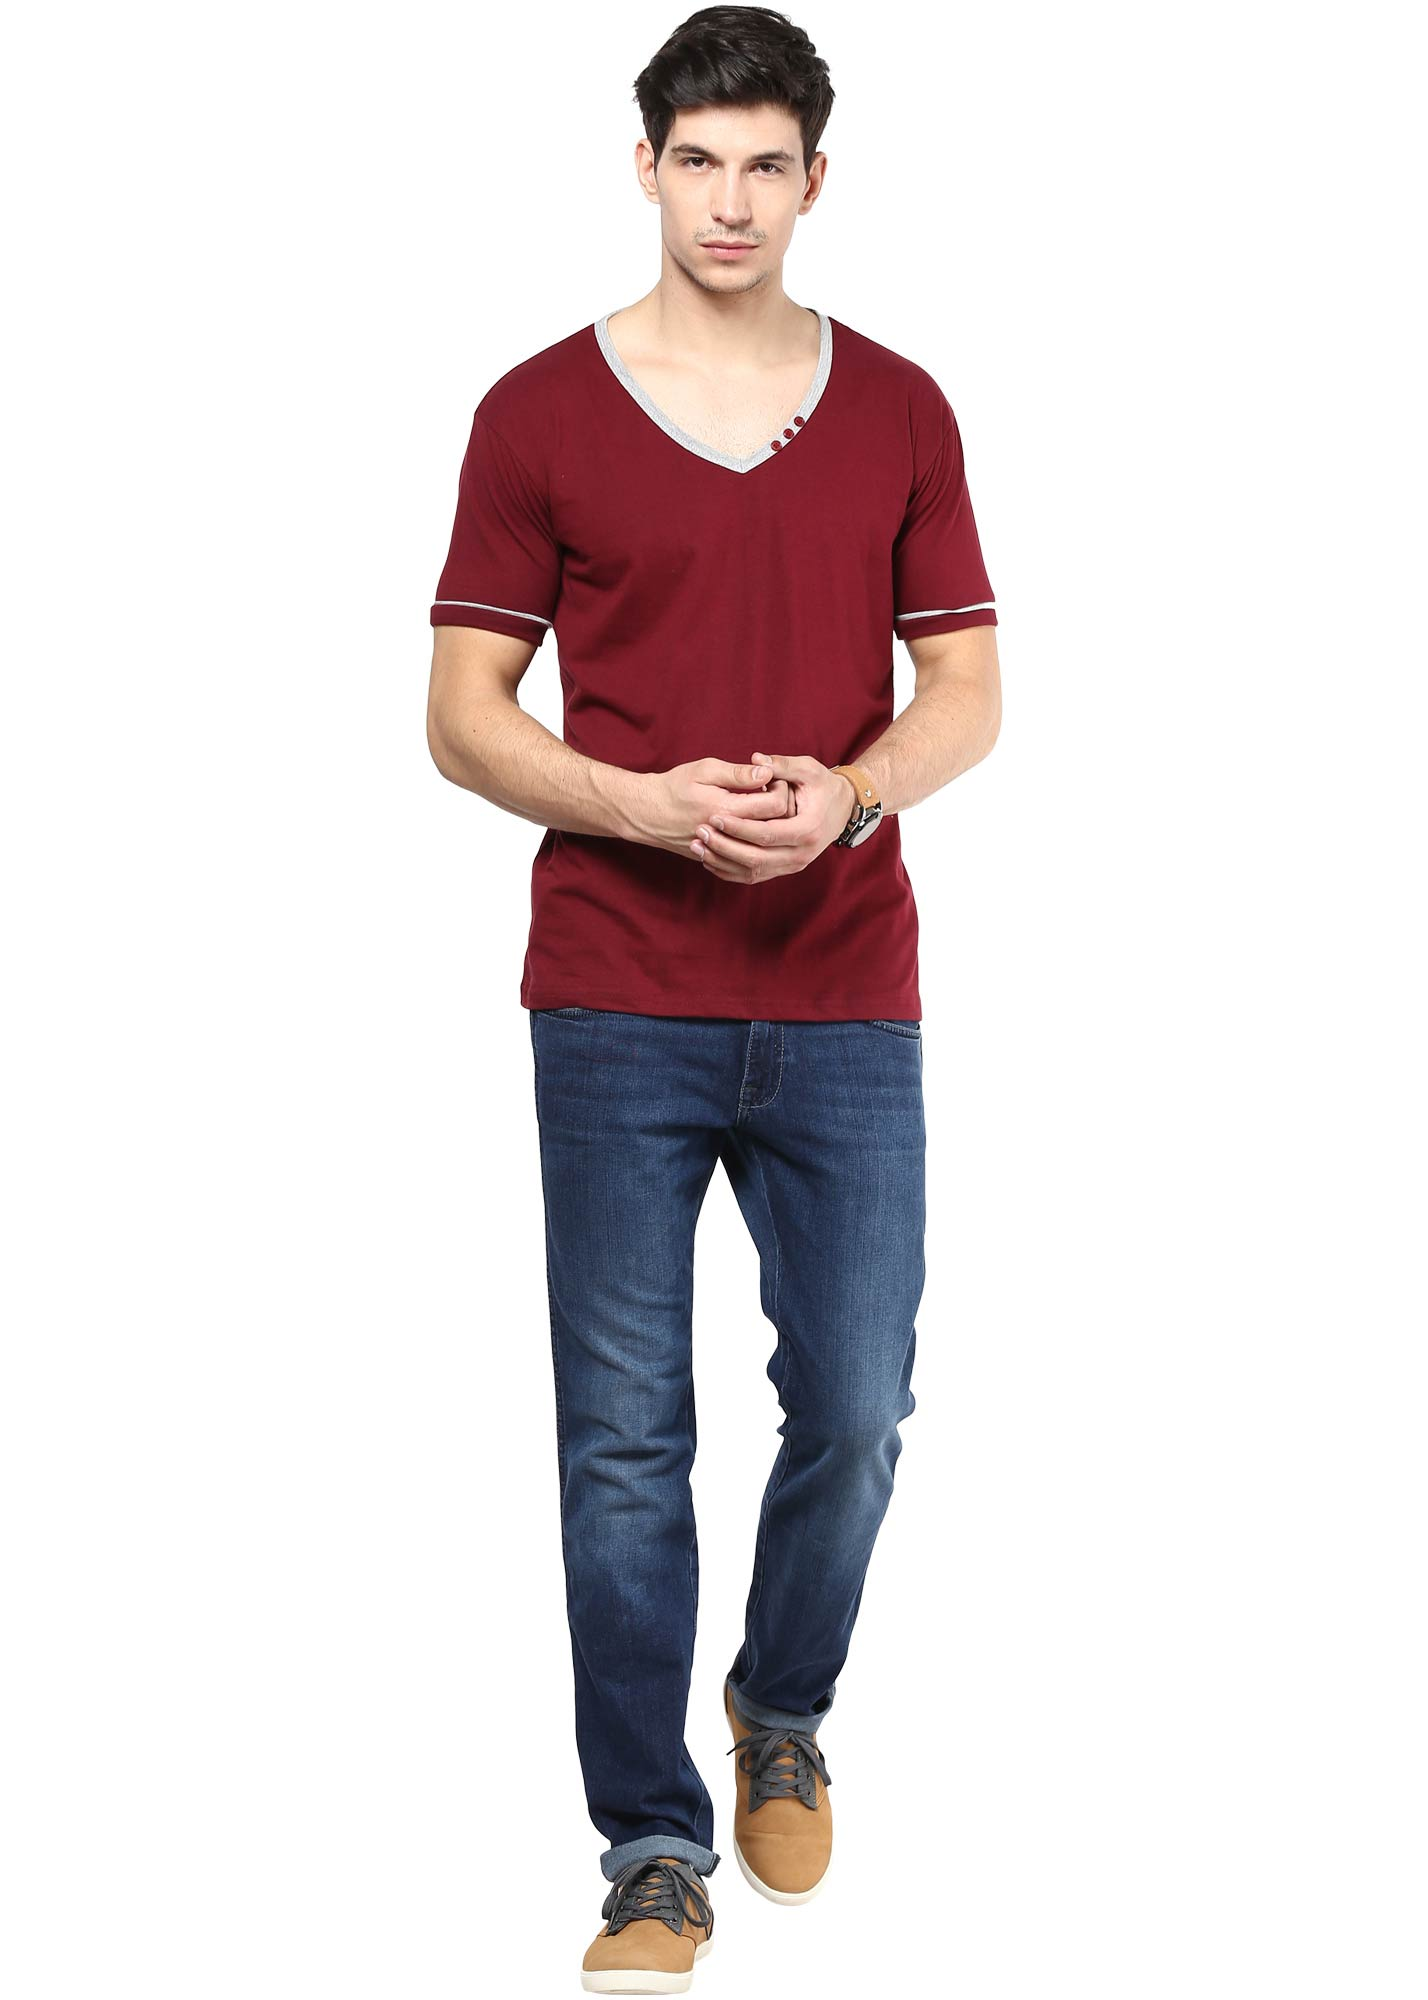 Izinc maroon coloured half sleeve cotton t shirt for men for Maroon t shirt for men